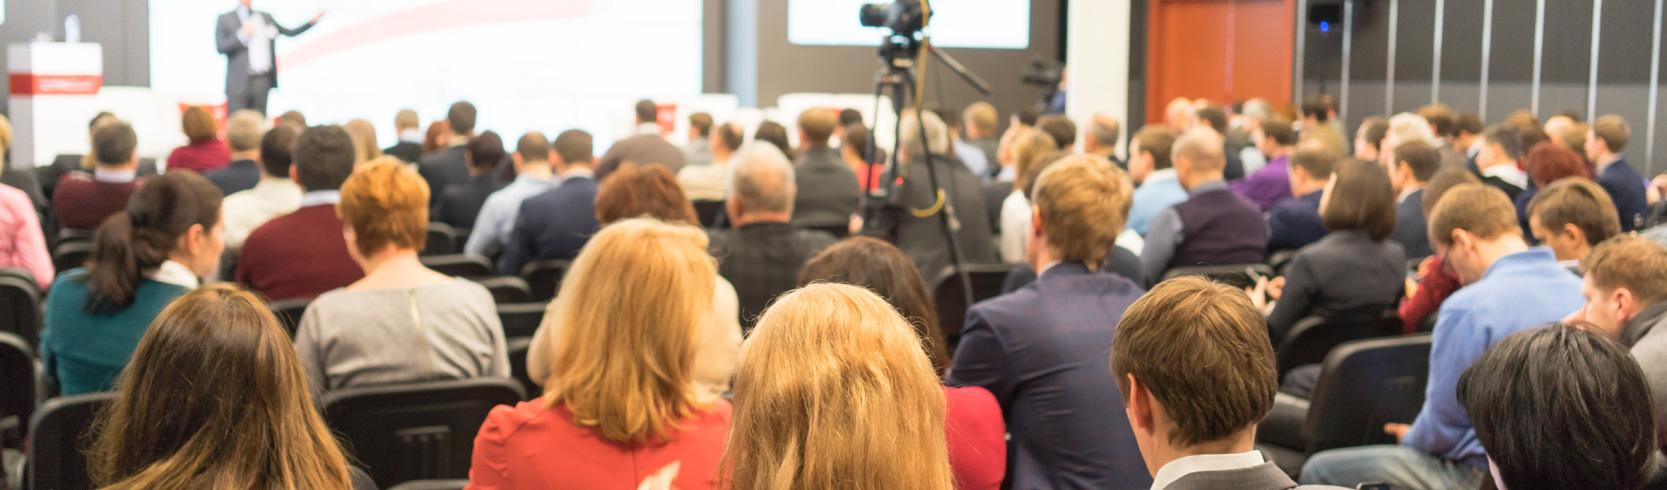 Meetups, Conferences & Workshops